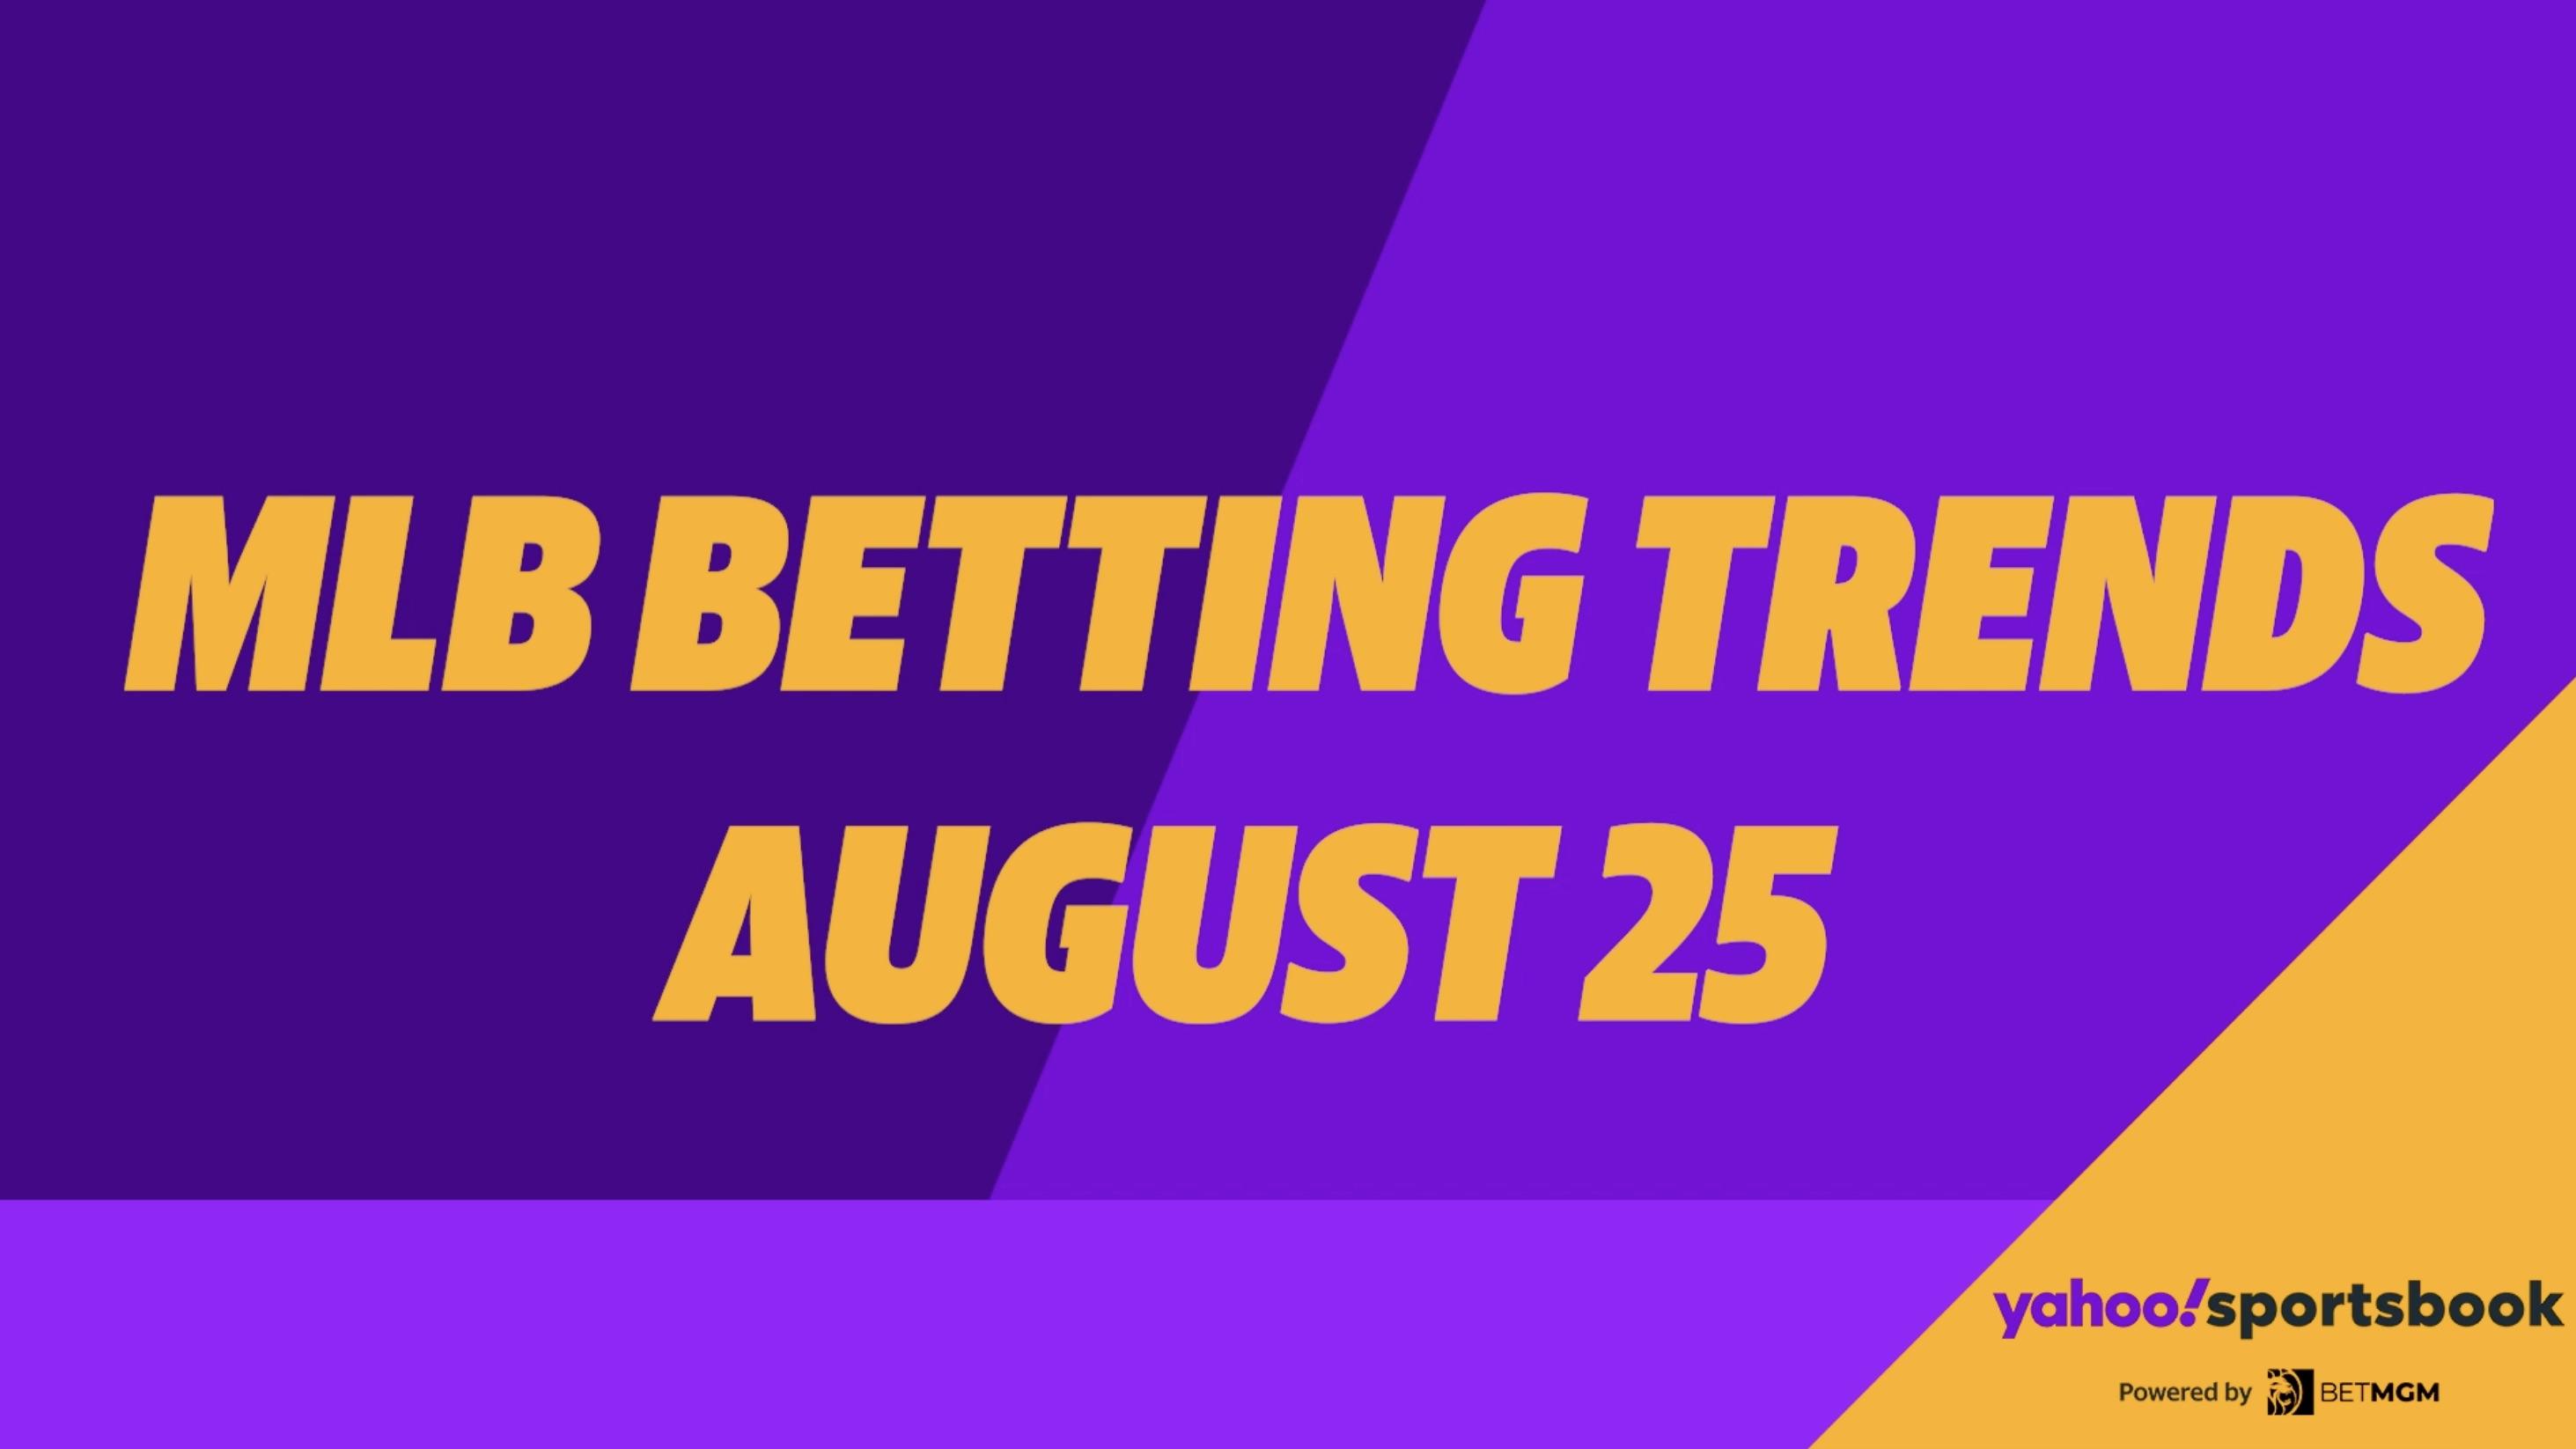 ntbg 2nd half betting